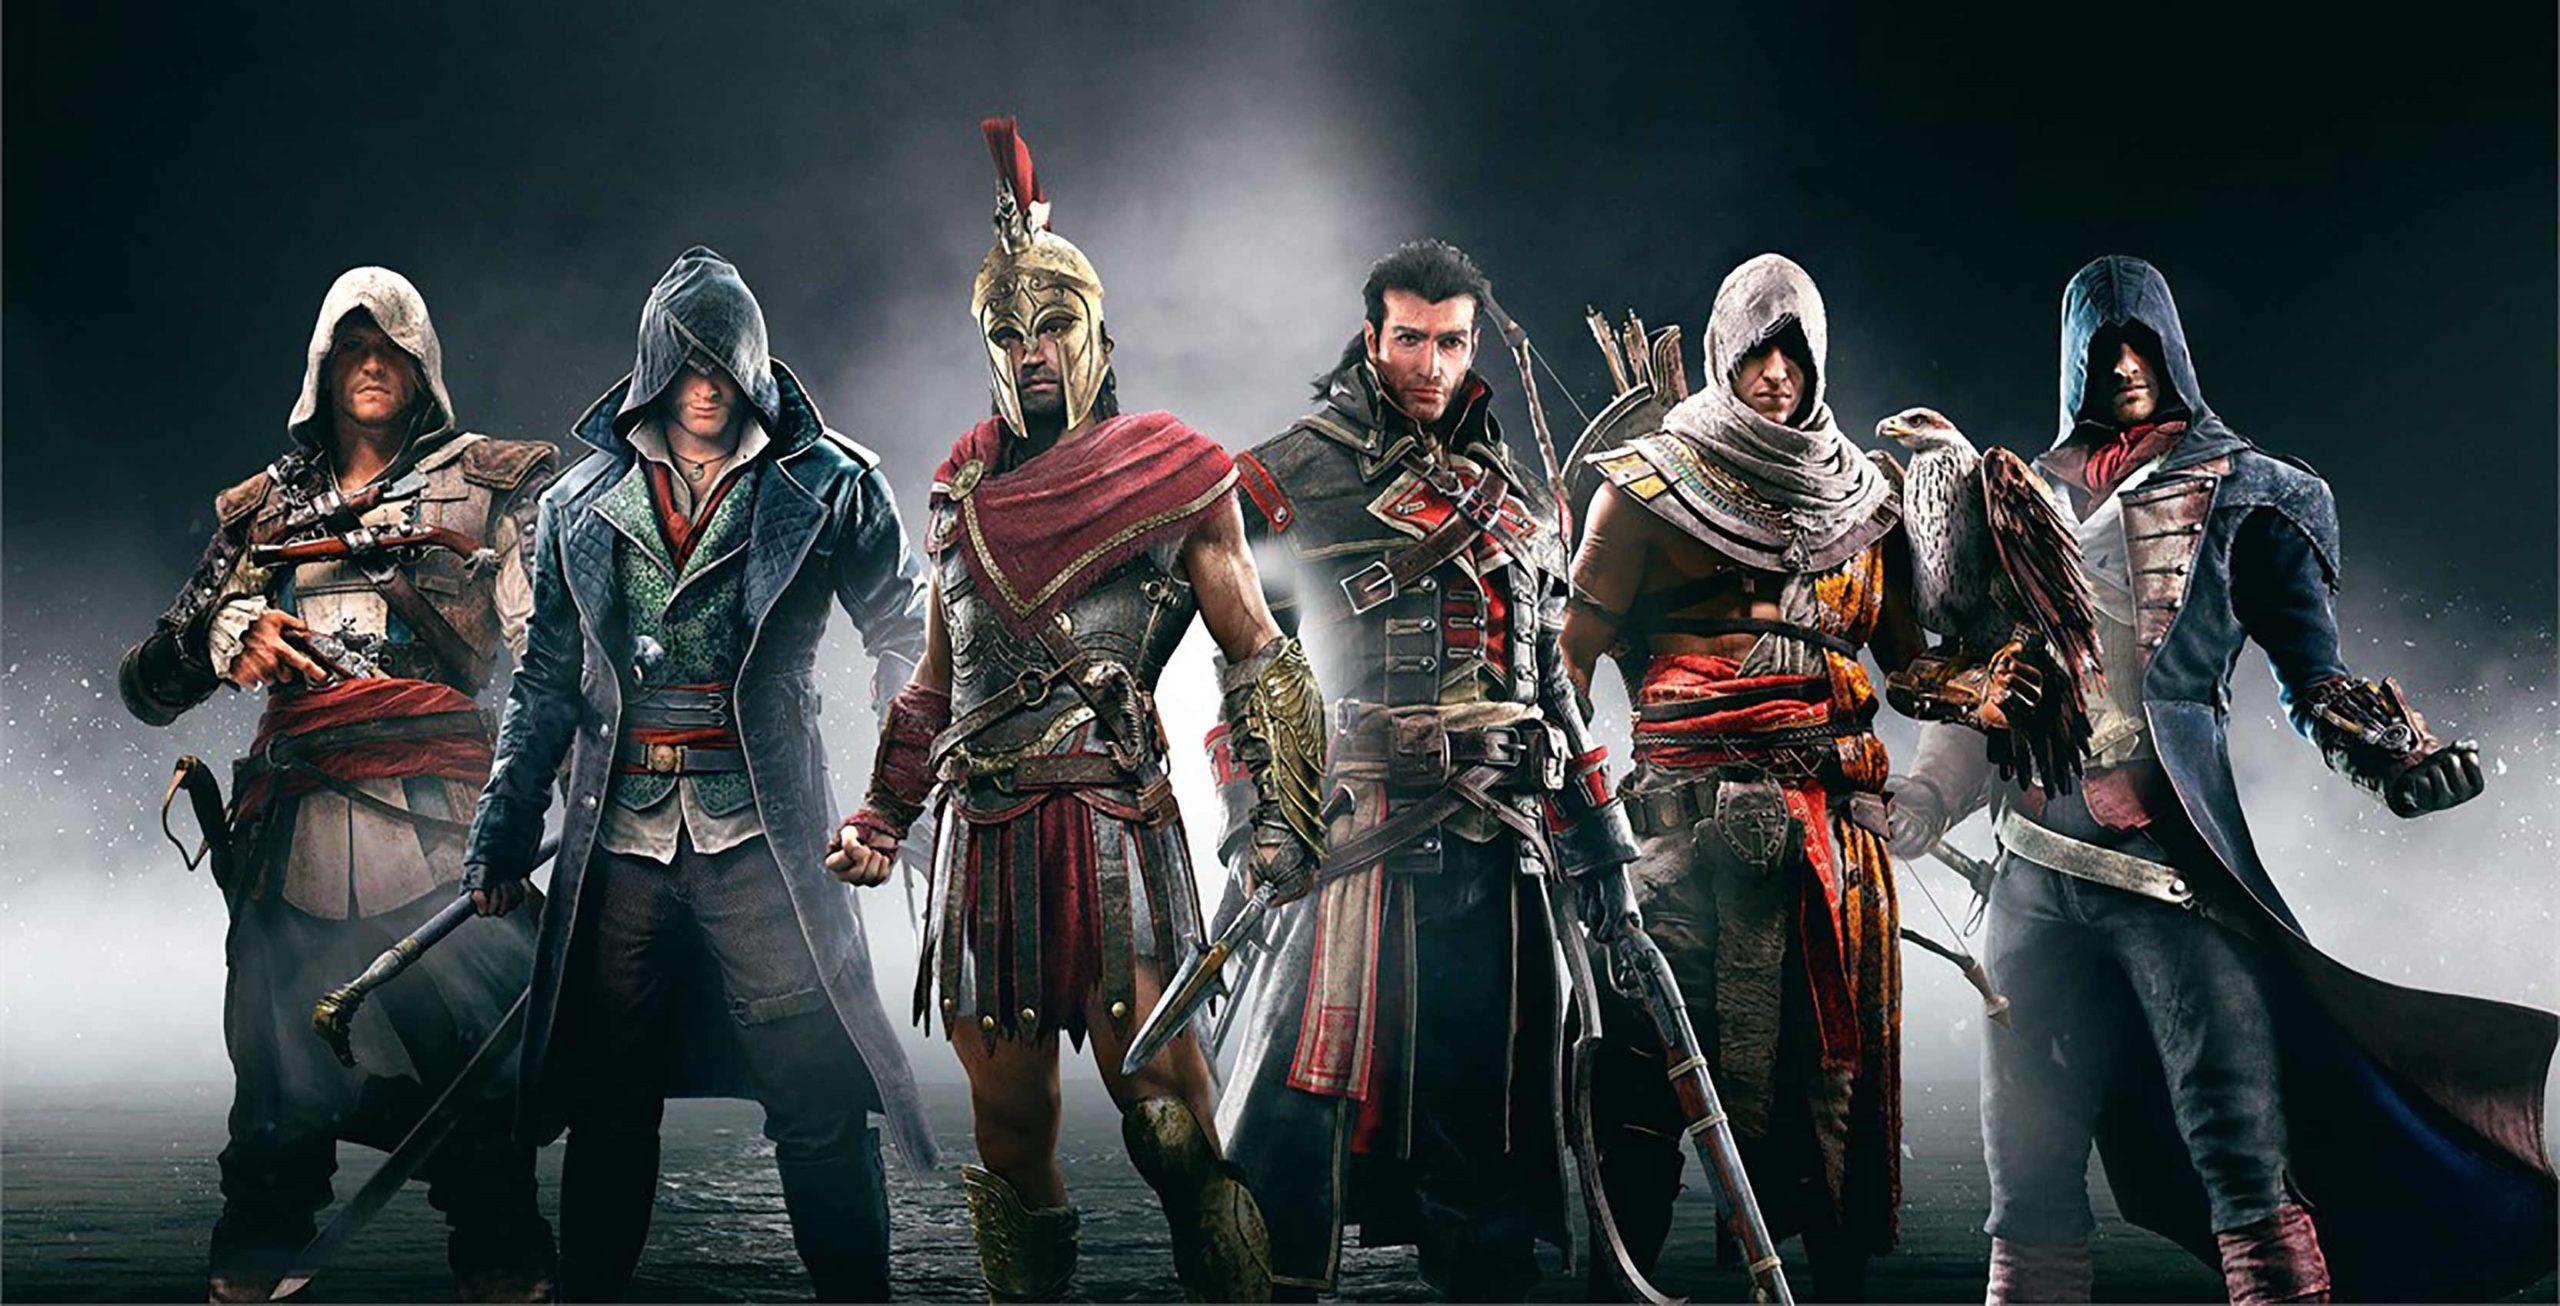 Ubisoft S 2020 Assassin S Creed Rumoured To Be A Cross Gen Co Op